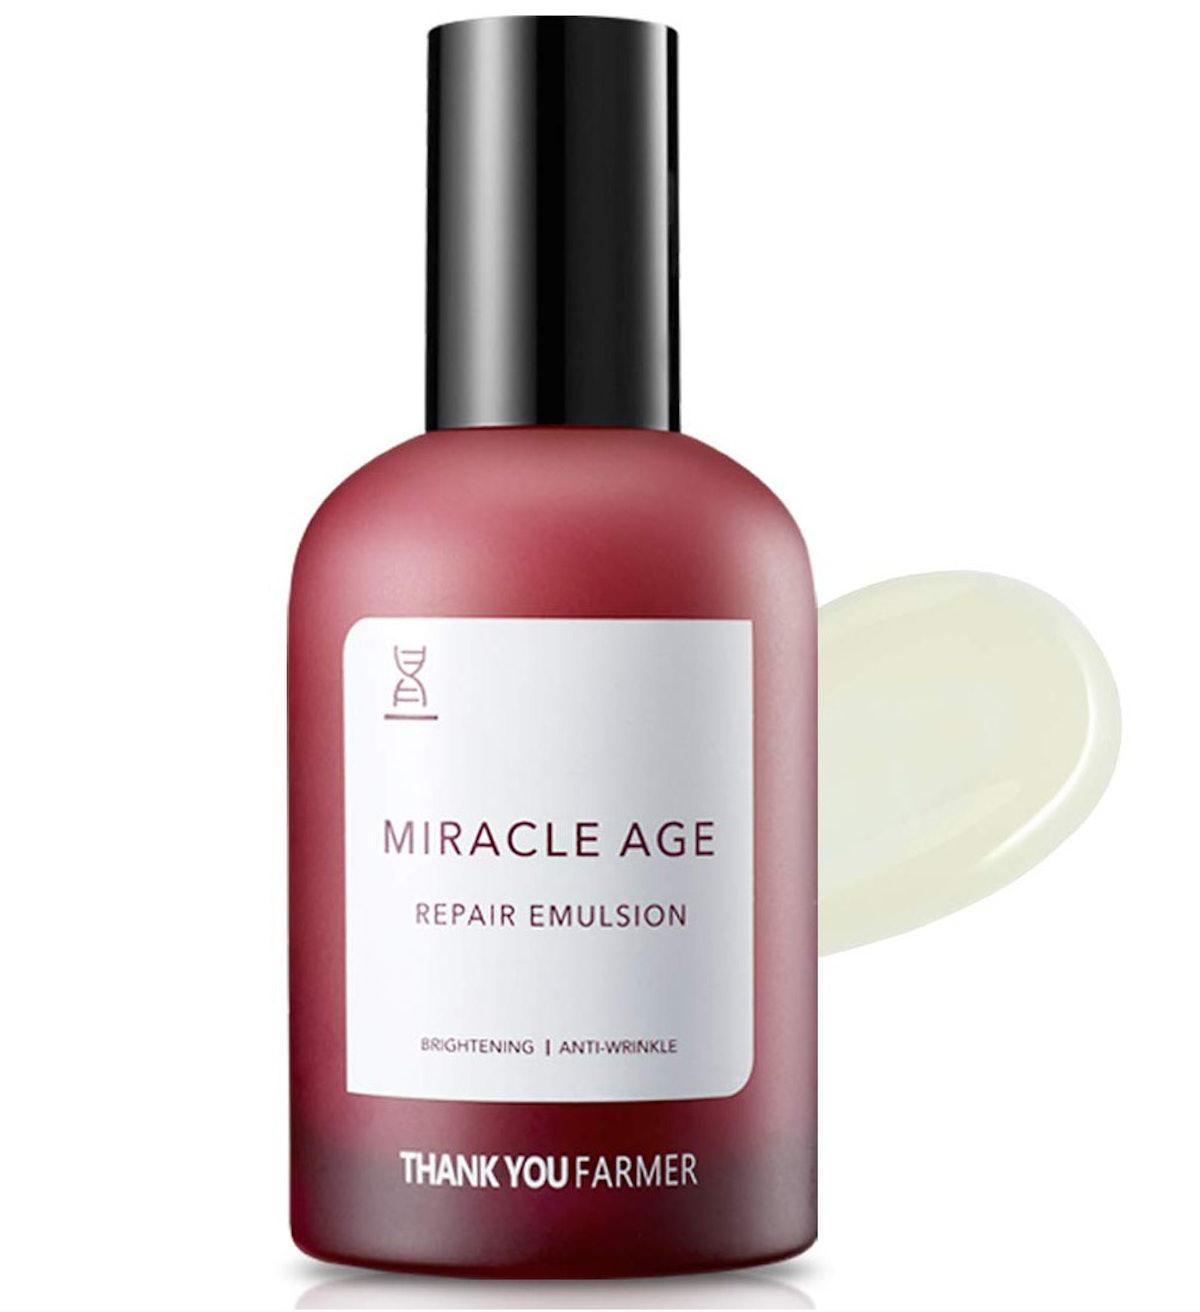 THANKYOU FARMER Miracle Age Repair Emulsion